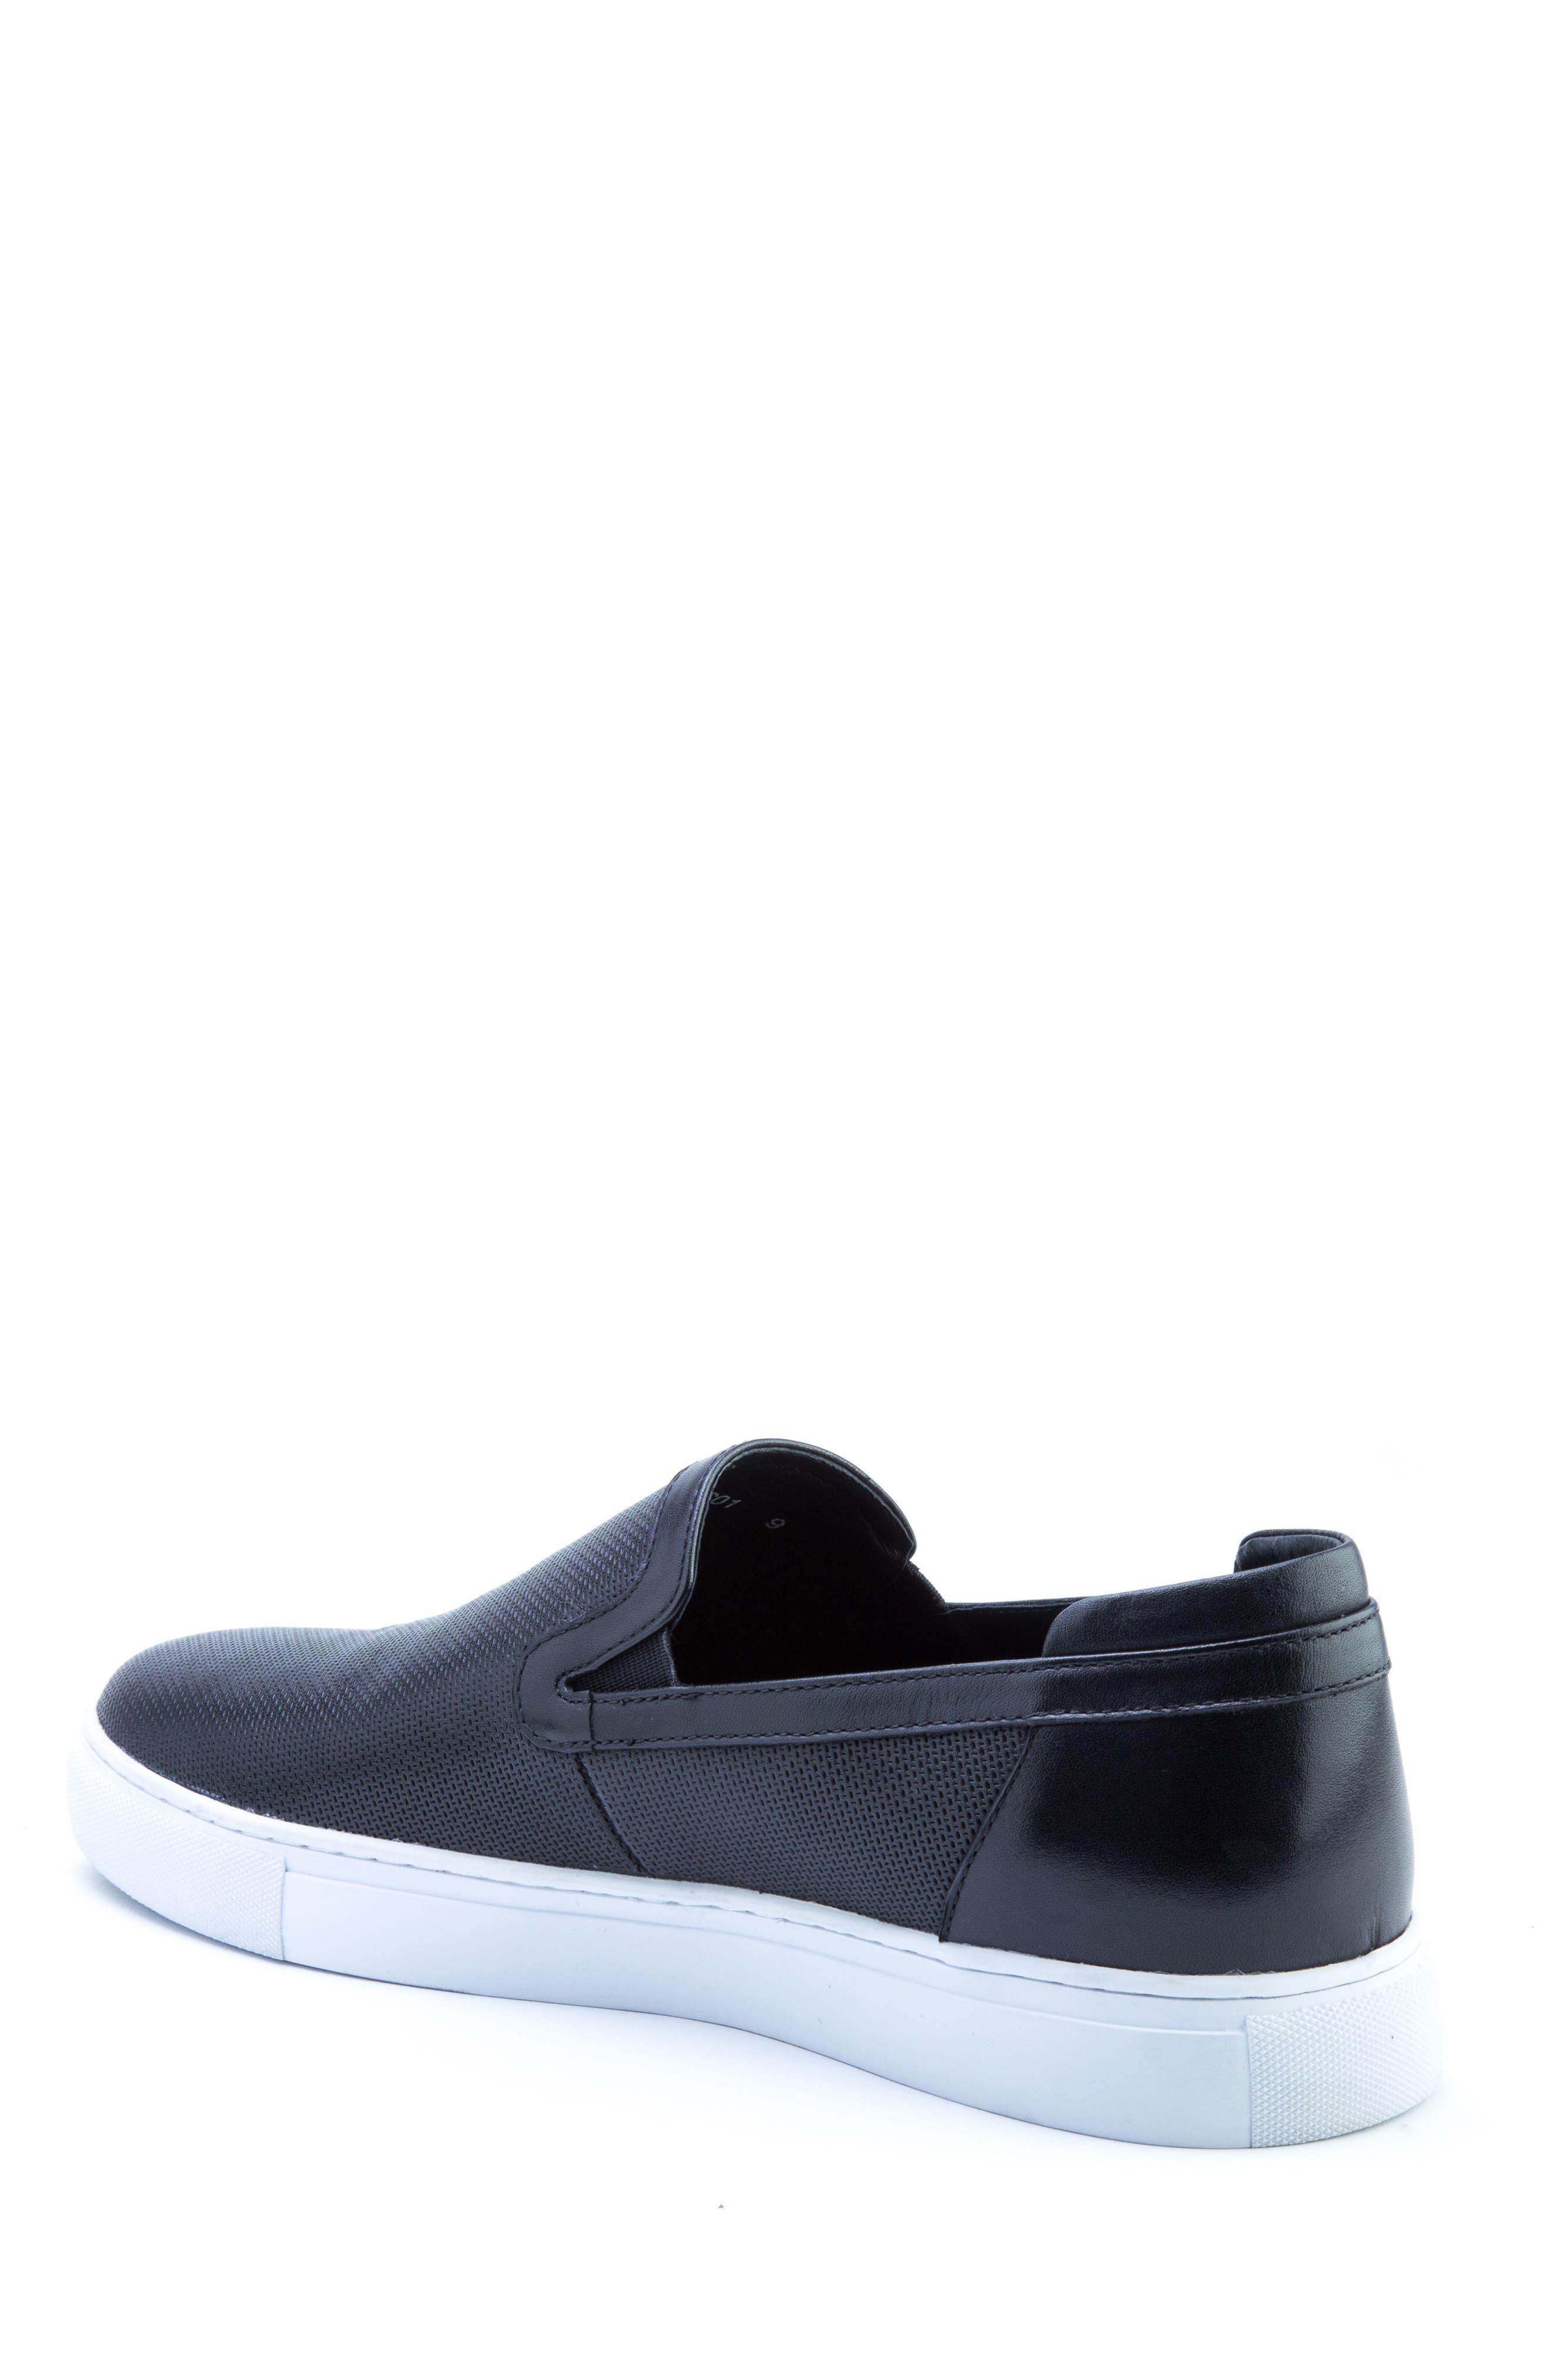 Grant Sneaker,                             Alternate thumbnail 2, color,                             BLACK LEATHER